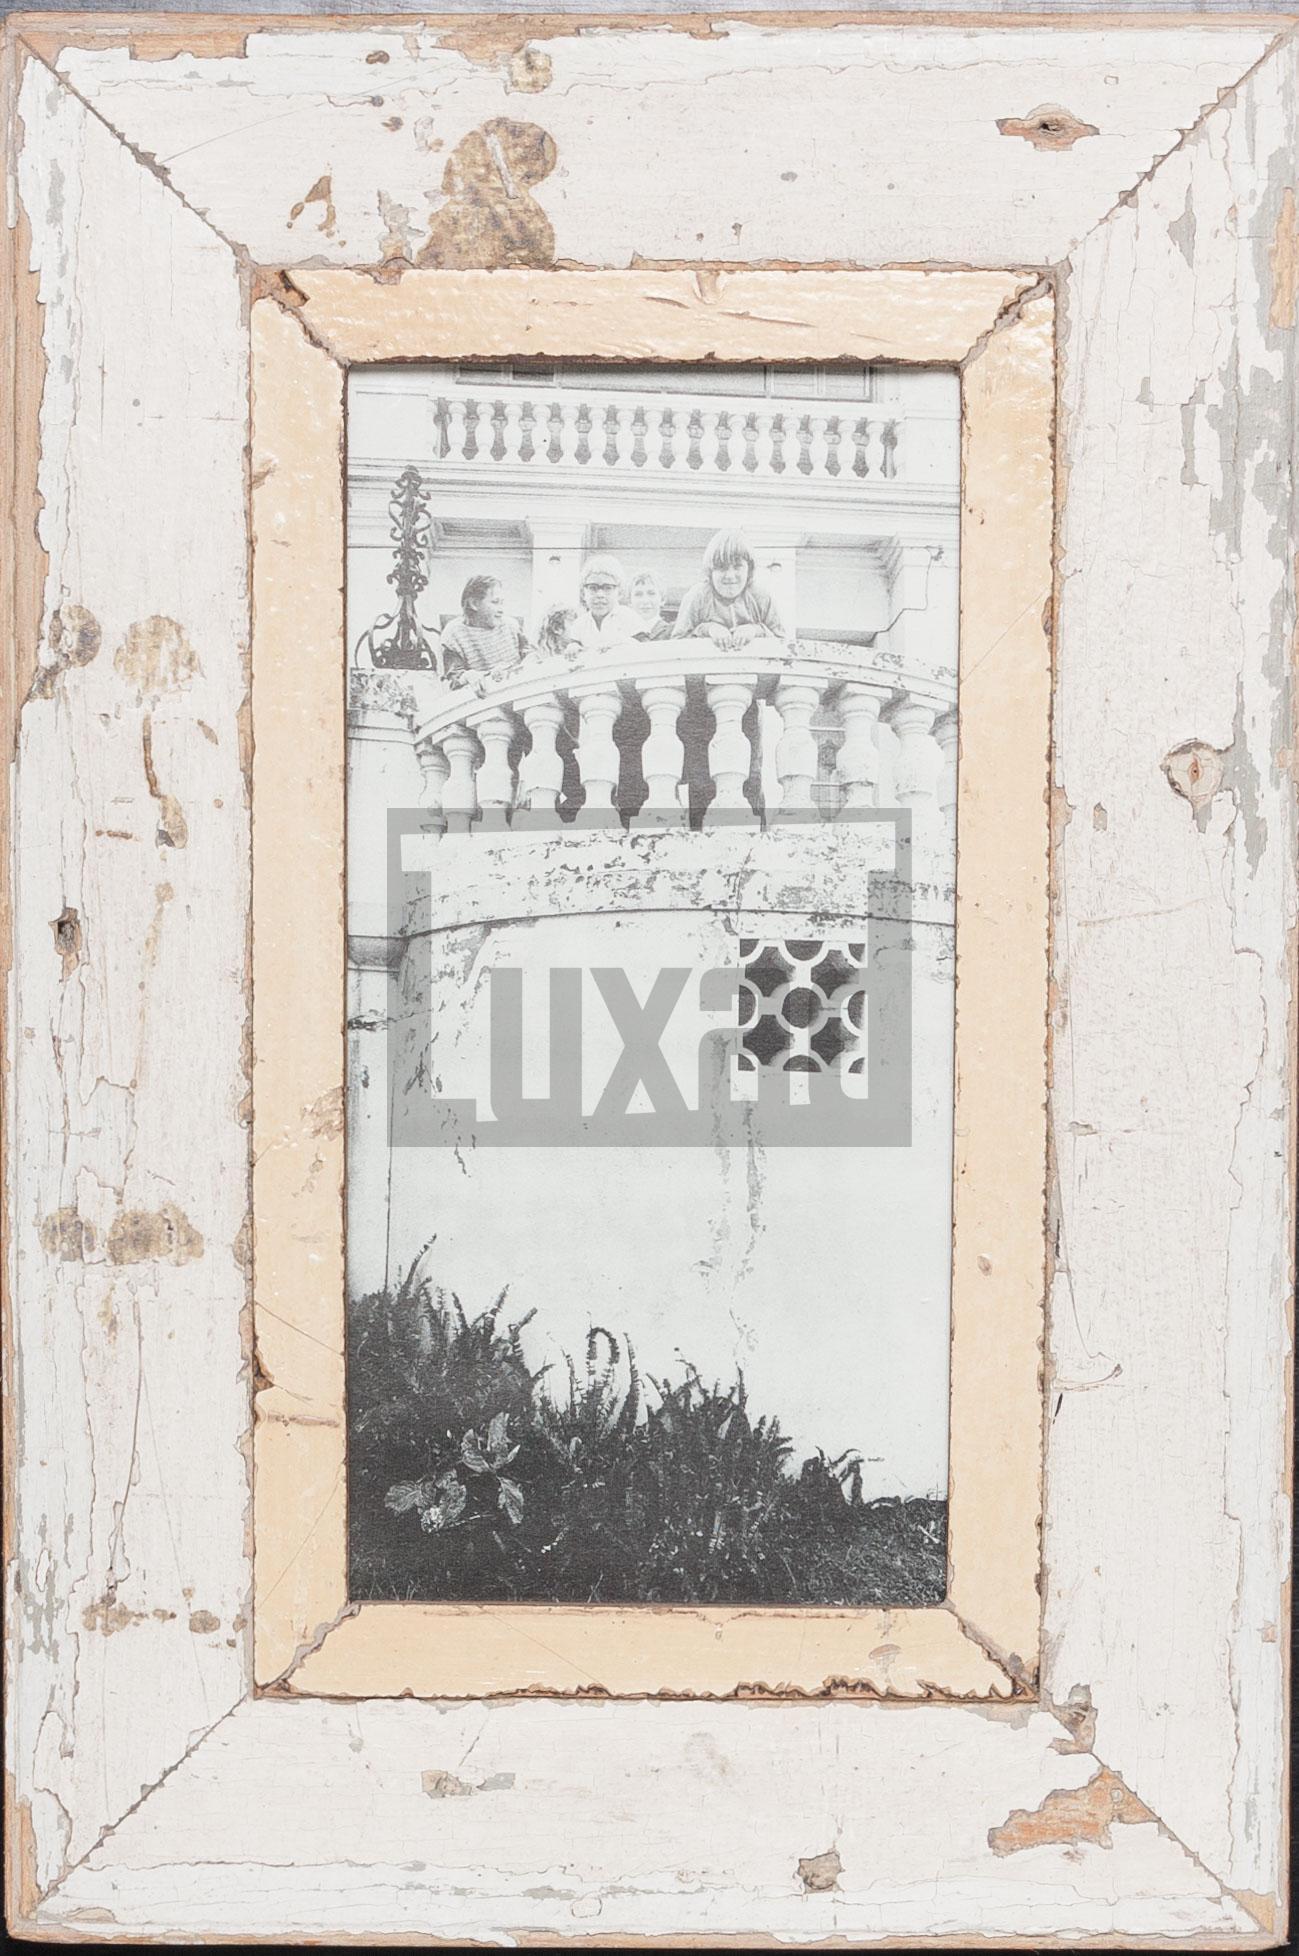 Panorama-Bilderrahmen aus recyceltem Holz für Panoramafotos